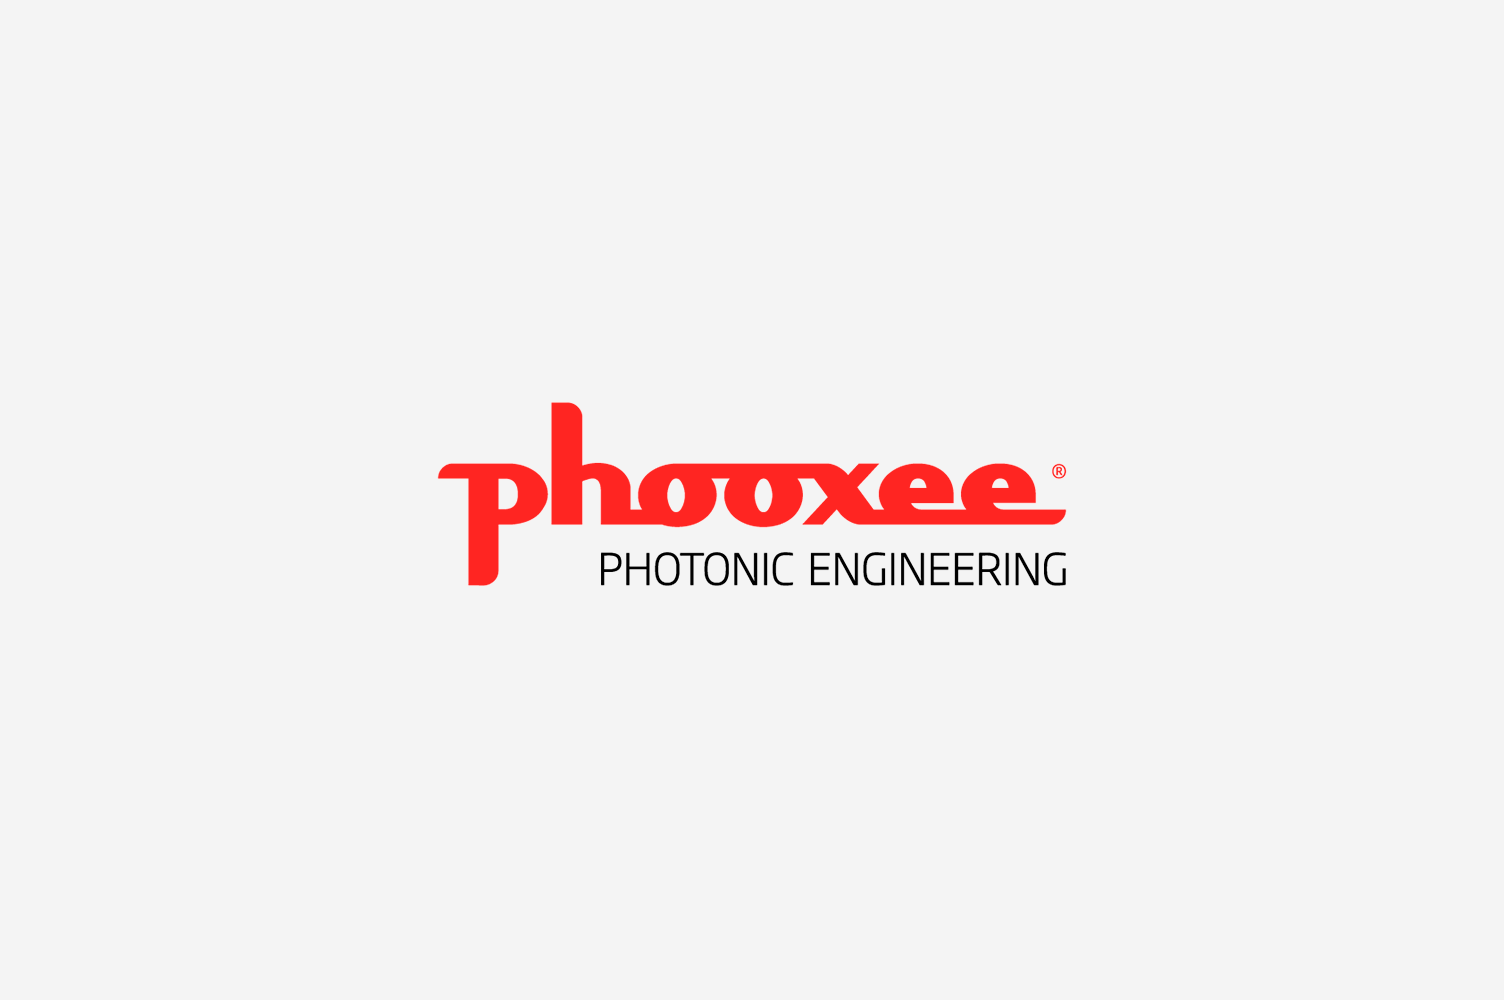 Naming y logotipo Phooxee v. A